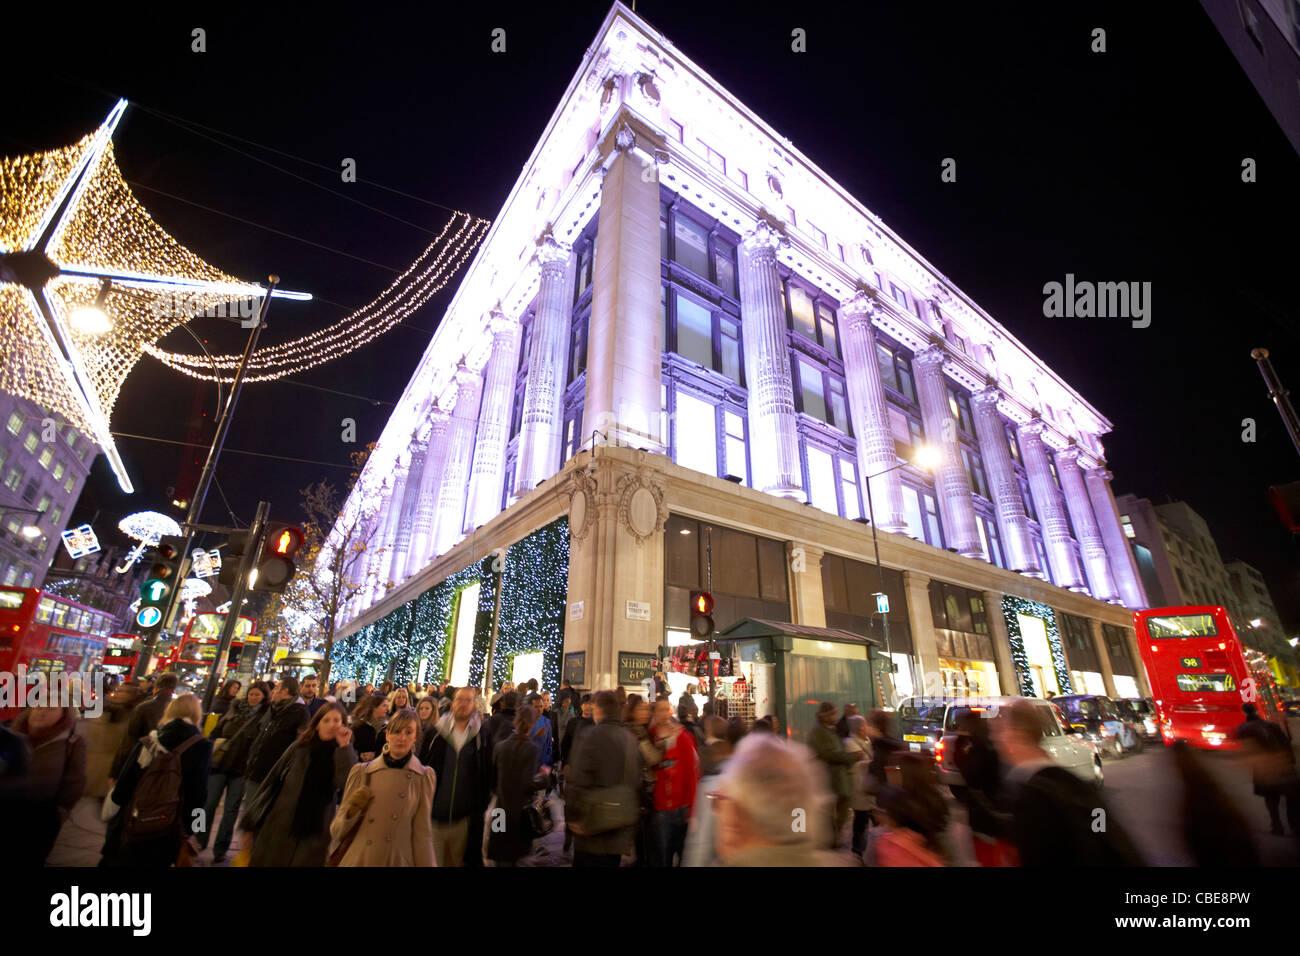 selfridges department store on oxford street christmas shopping london england united kingdom uk - Stock Image